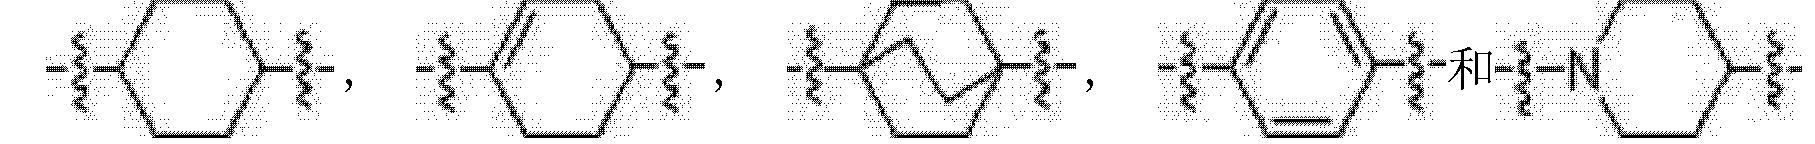 Figure CN102378762AD00211